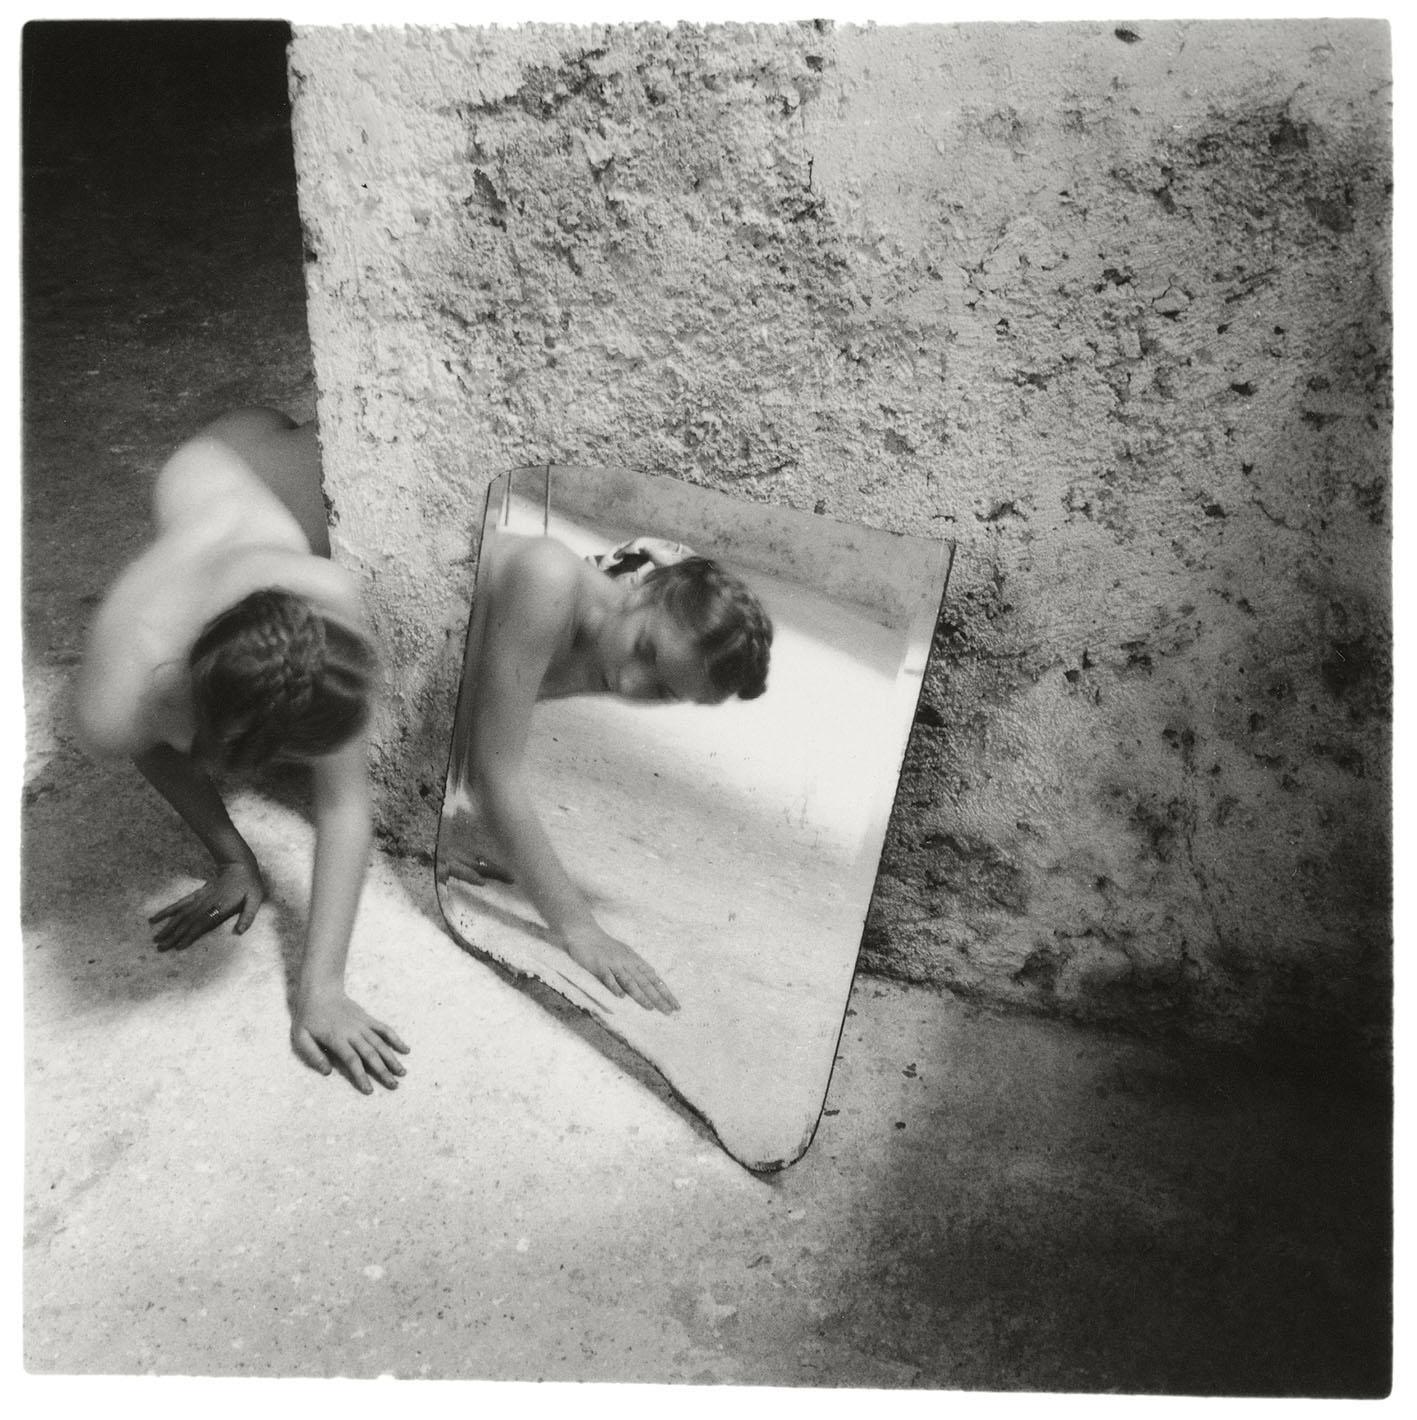 Francesca Woodman, Self-Deceit # 1, 1978. © Betty and George Woodman.